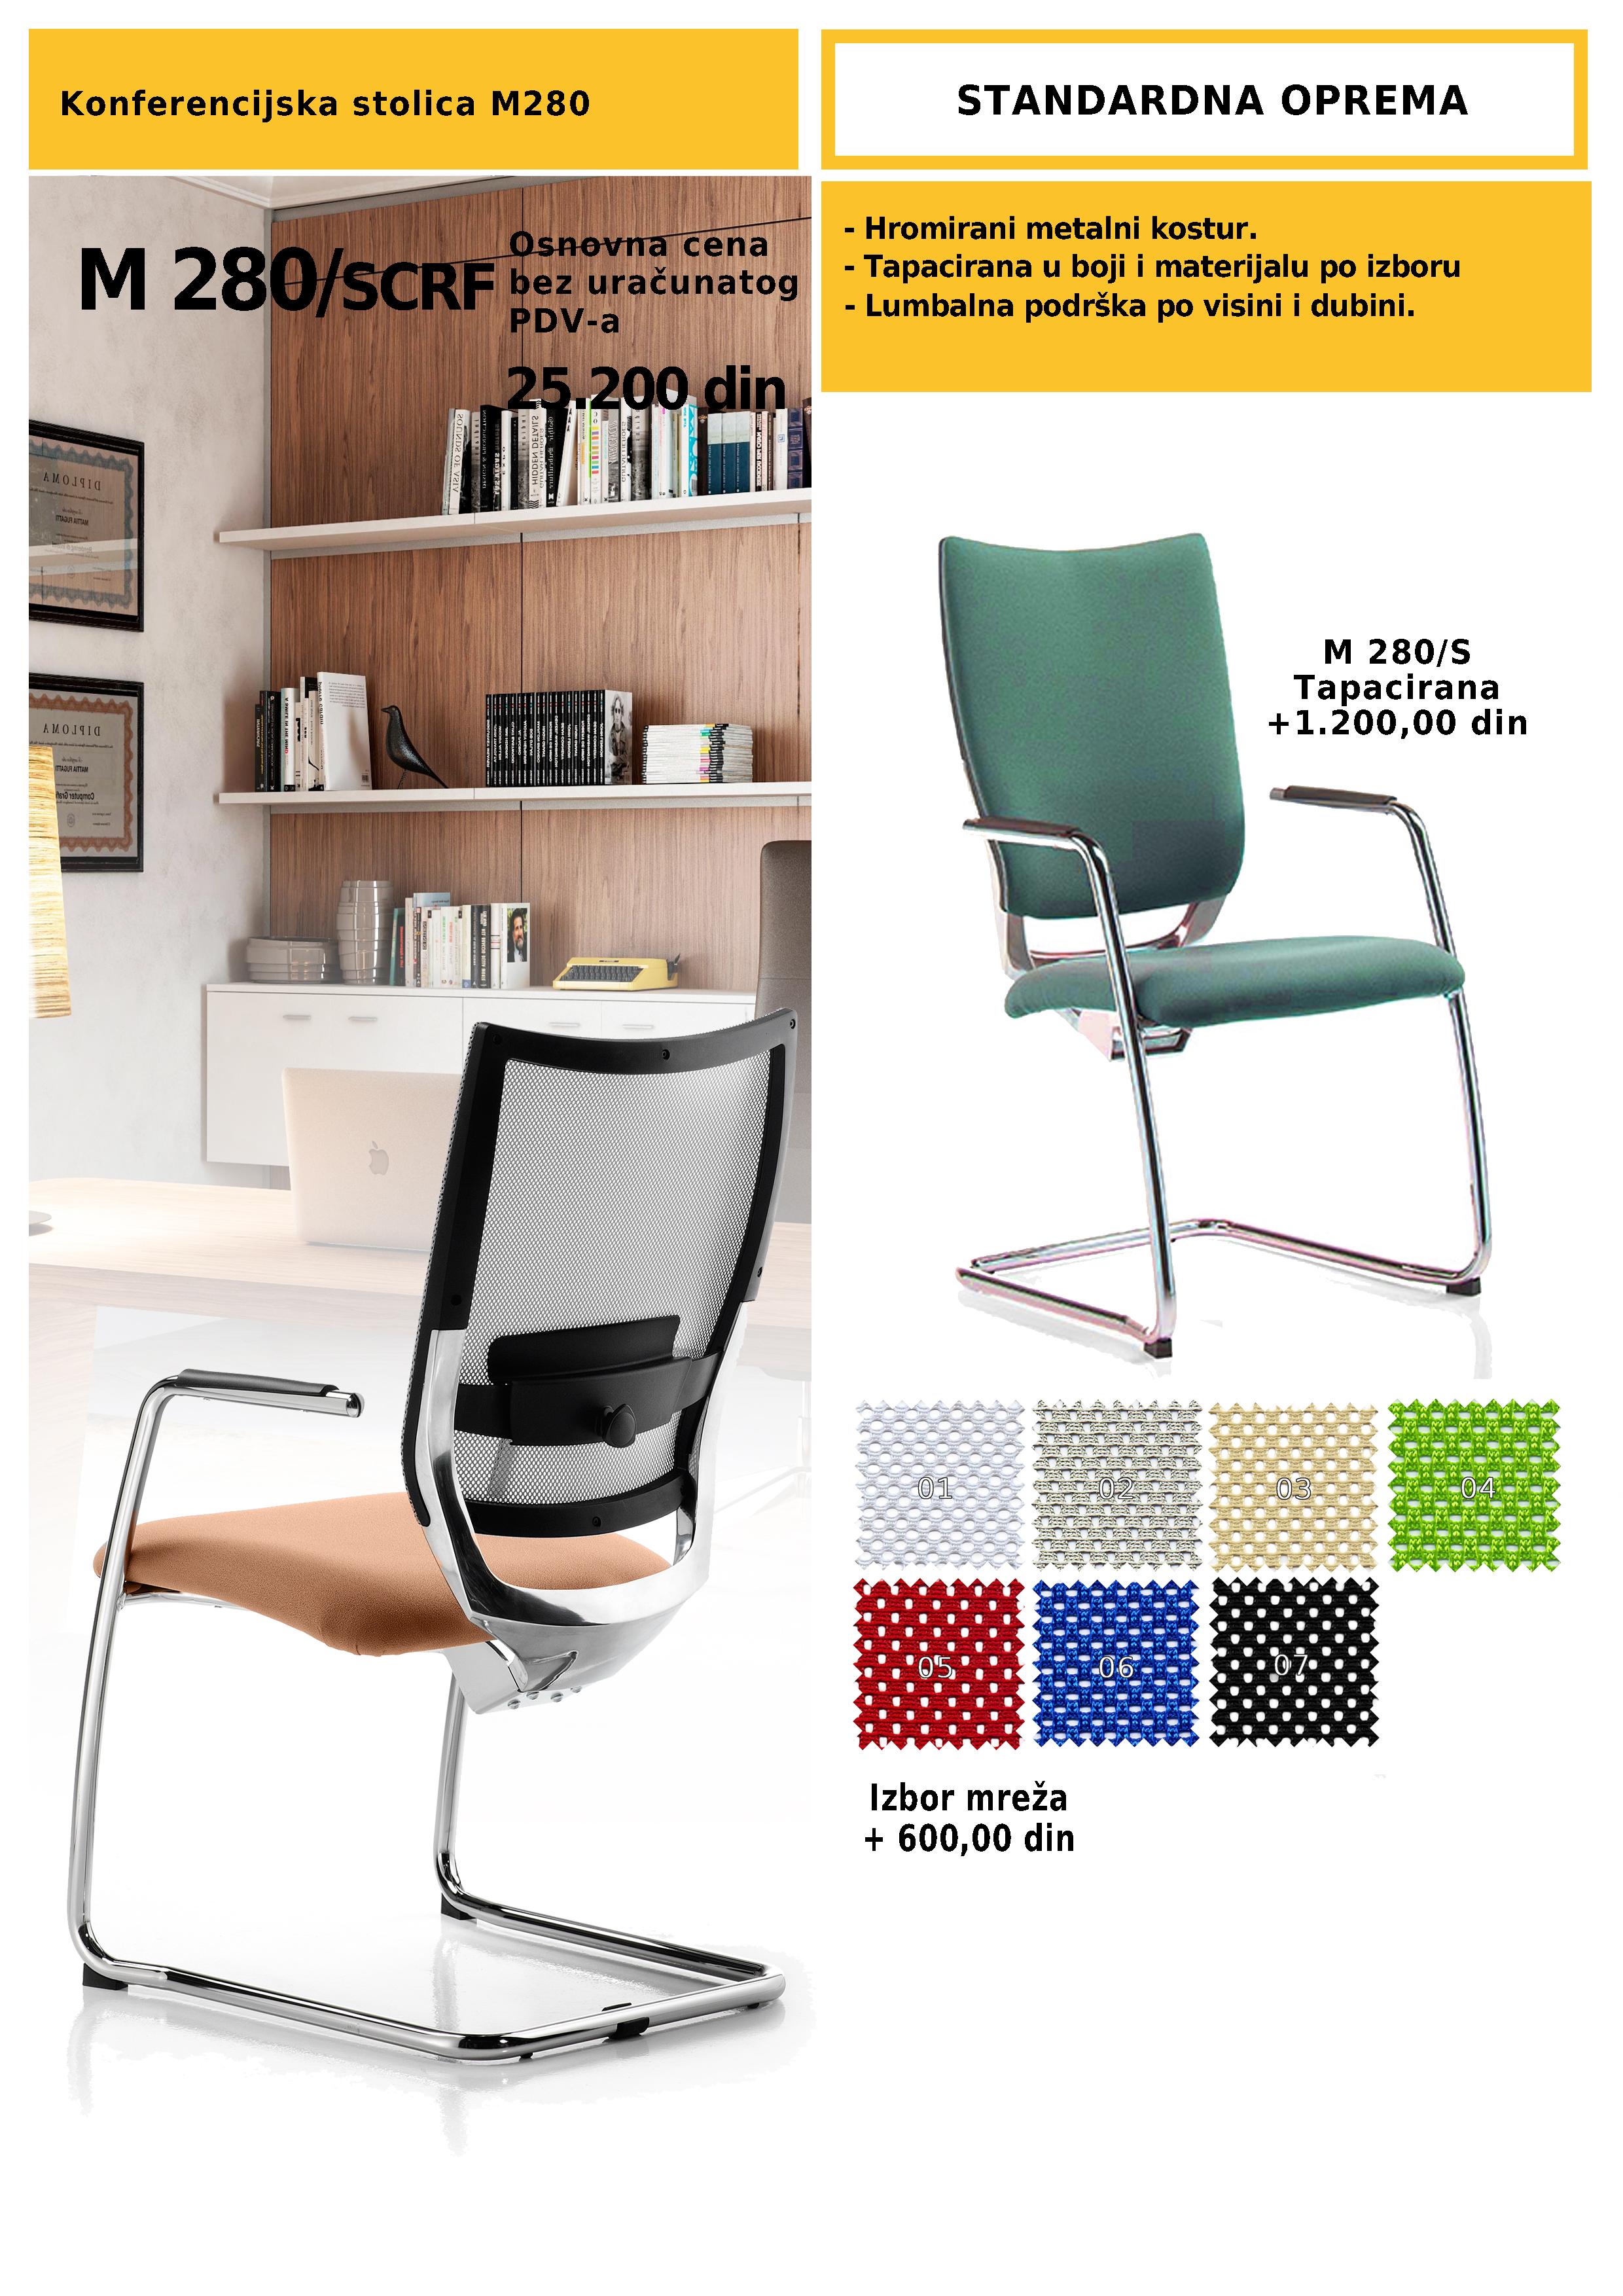 Konferencijska stolica M 280/S